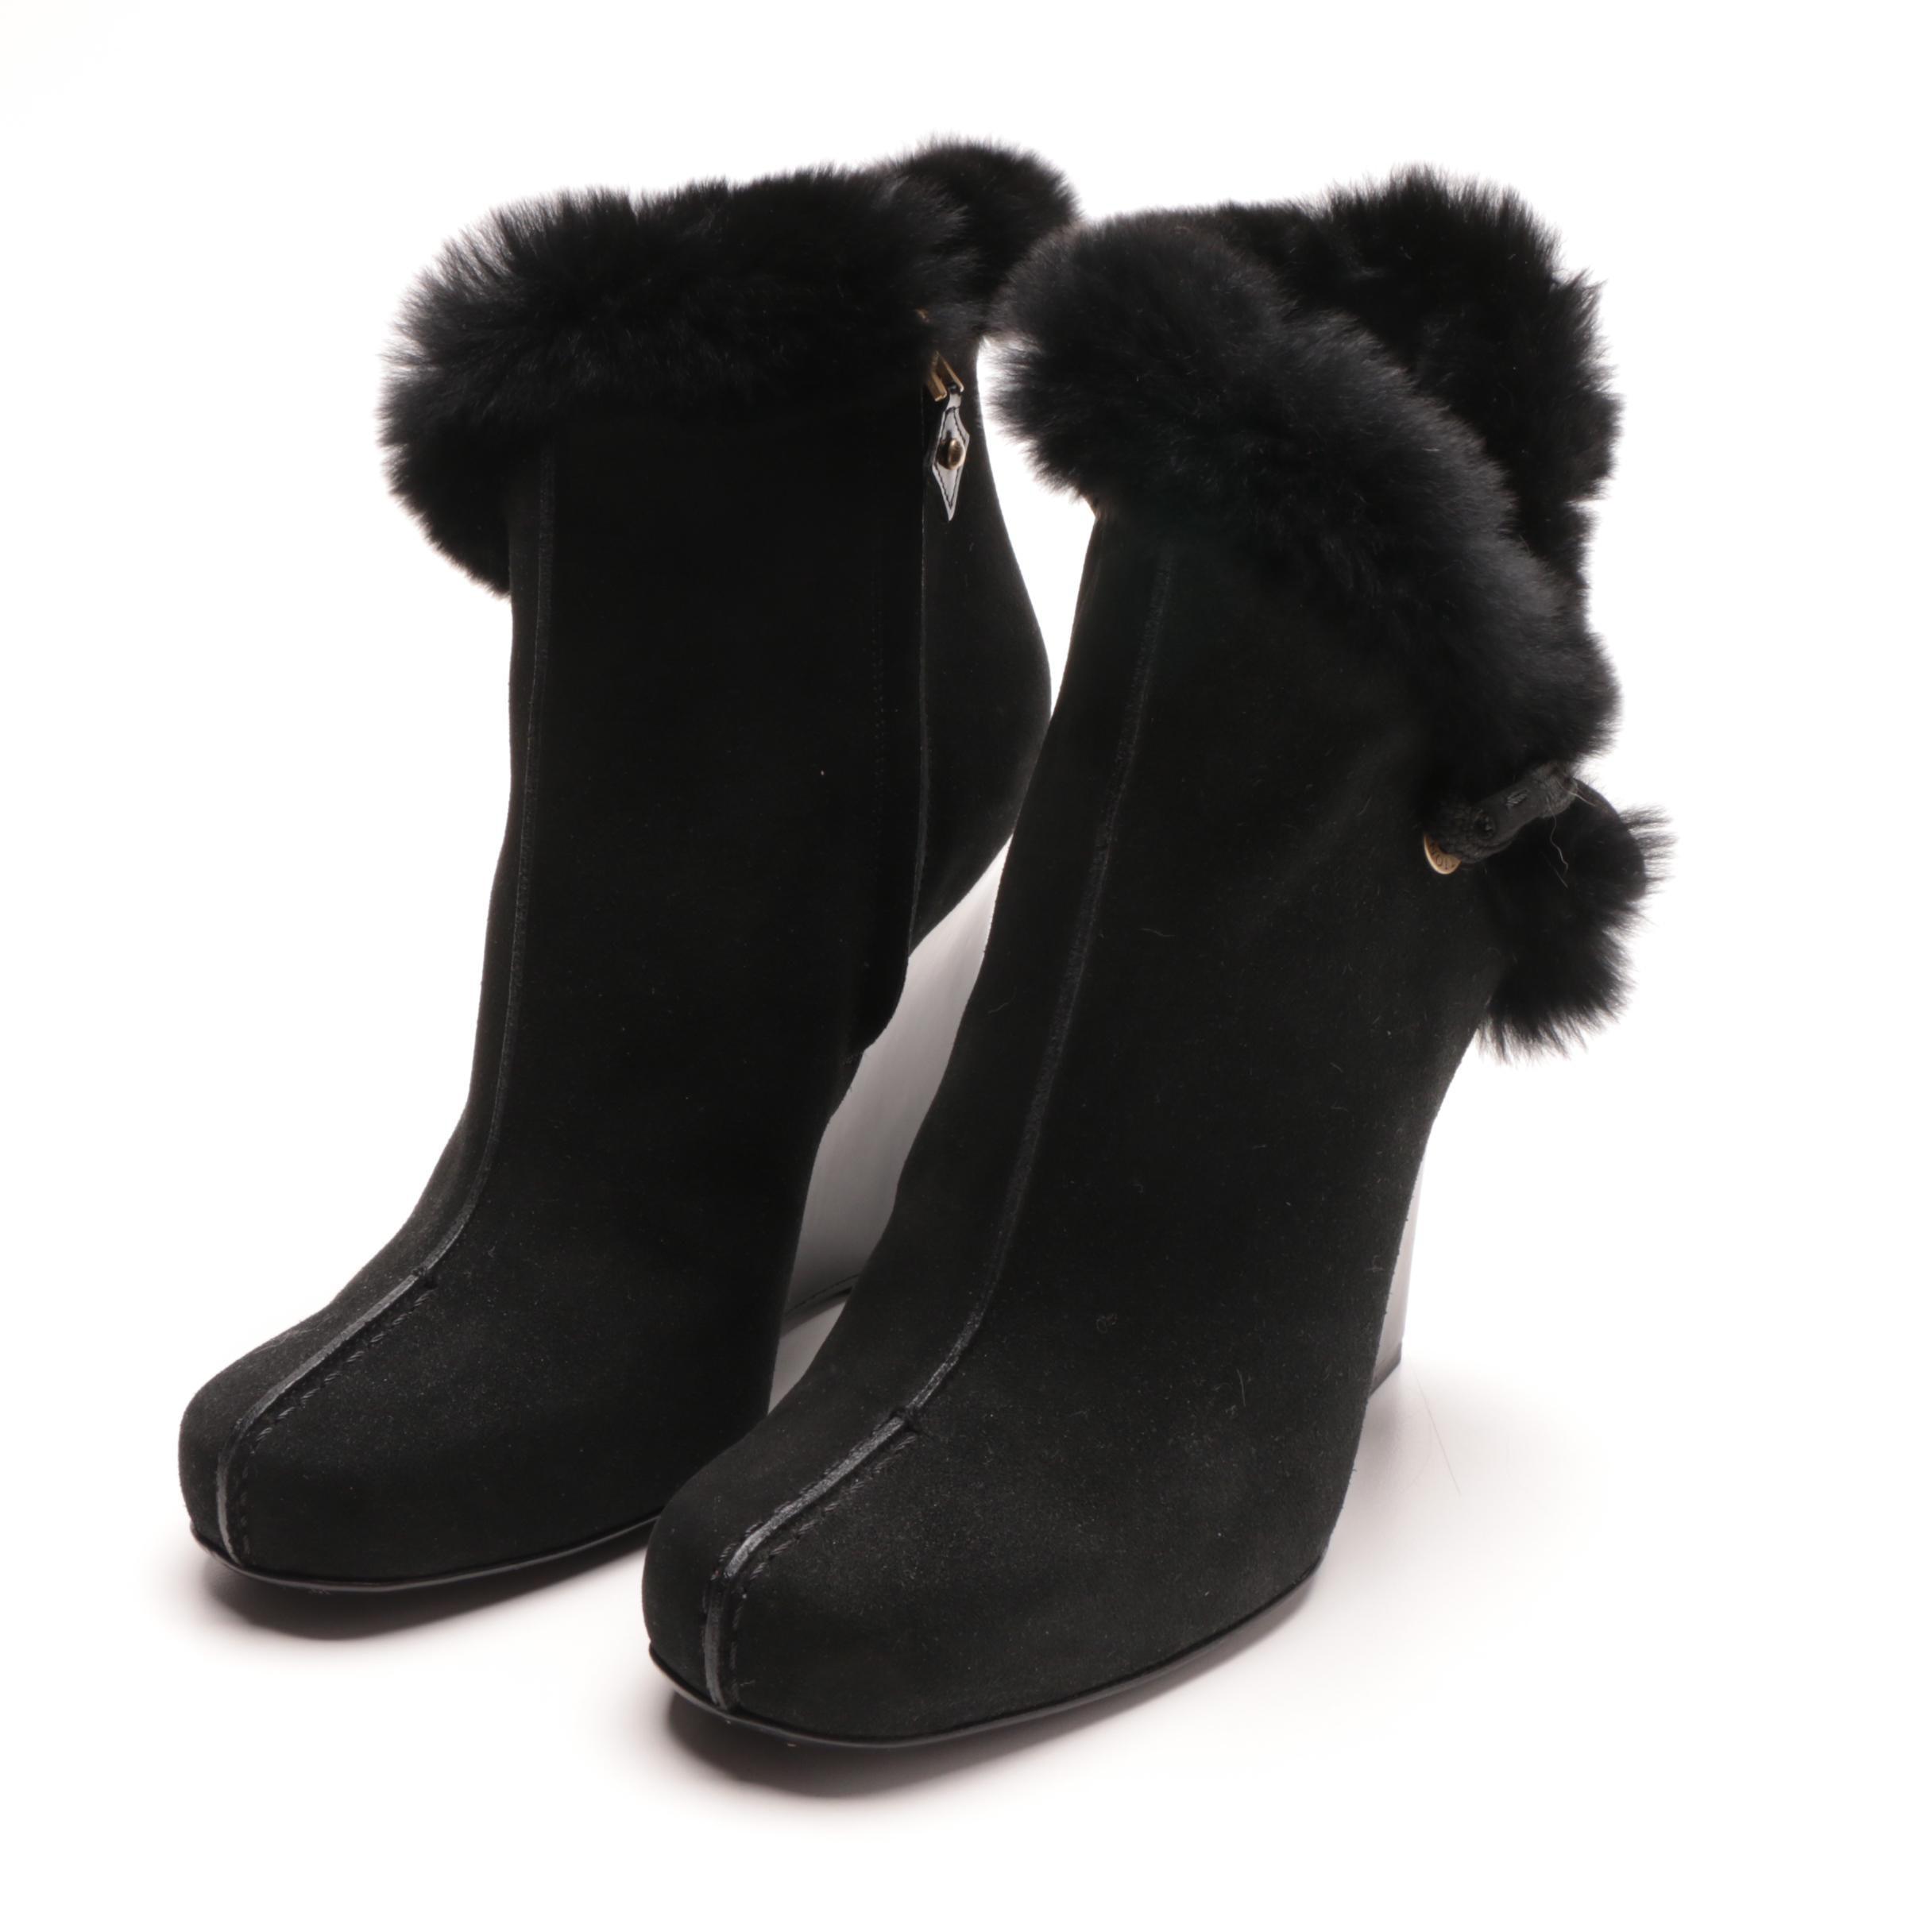 Louis Vuitton Black Suede Fur Trimmed Wedge Booties